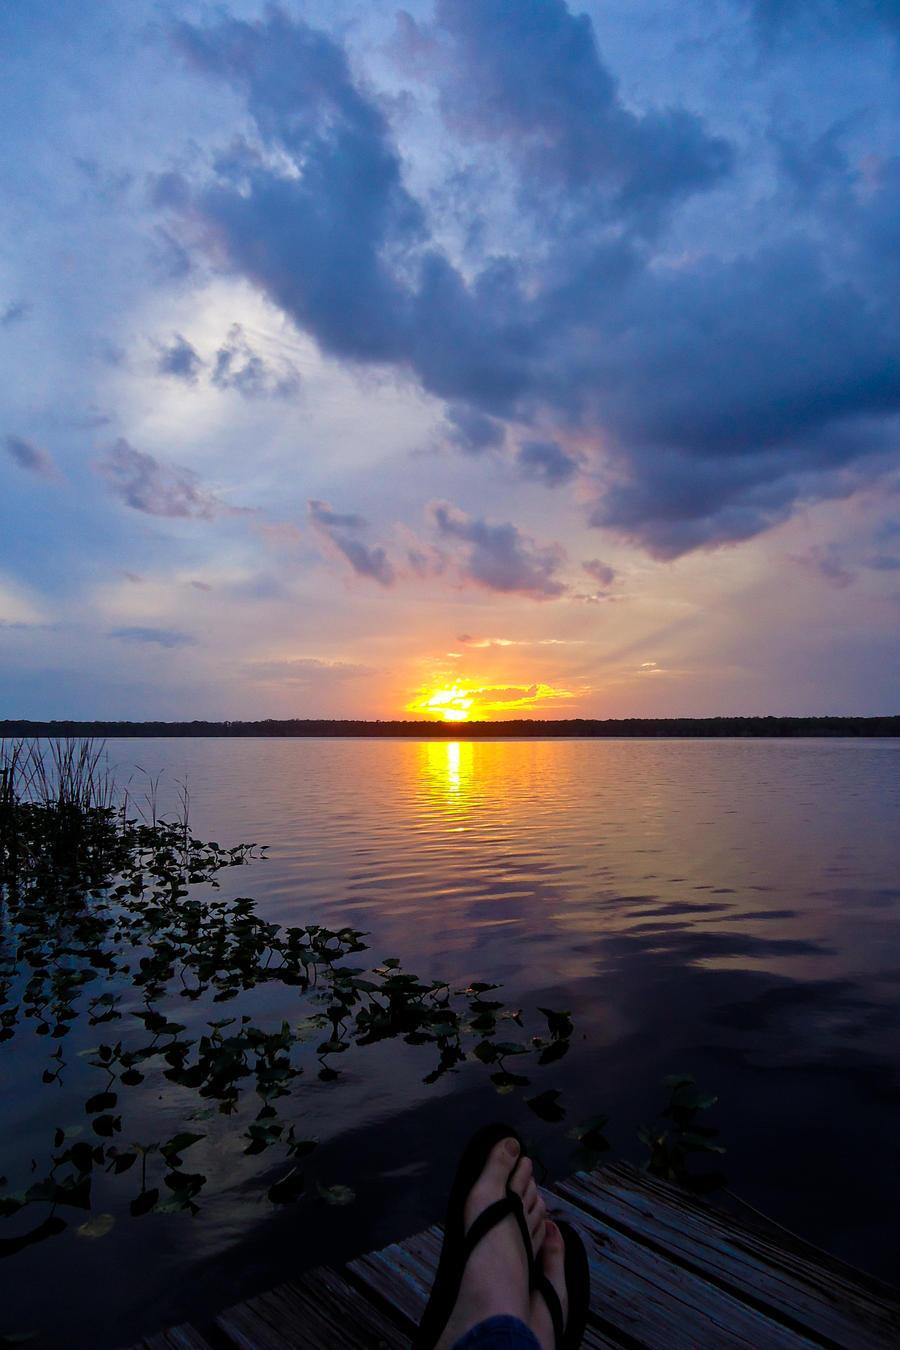 Sunset on the Lake by MordsithCara